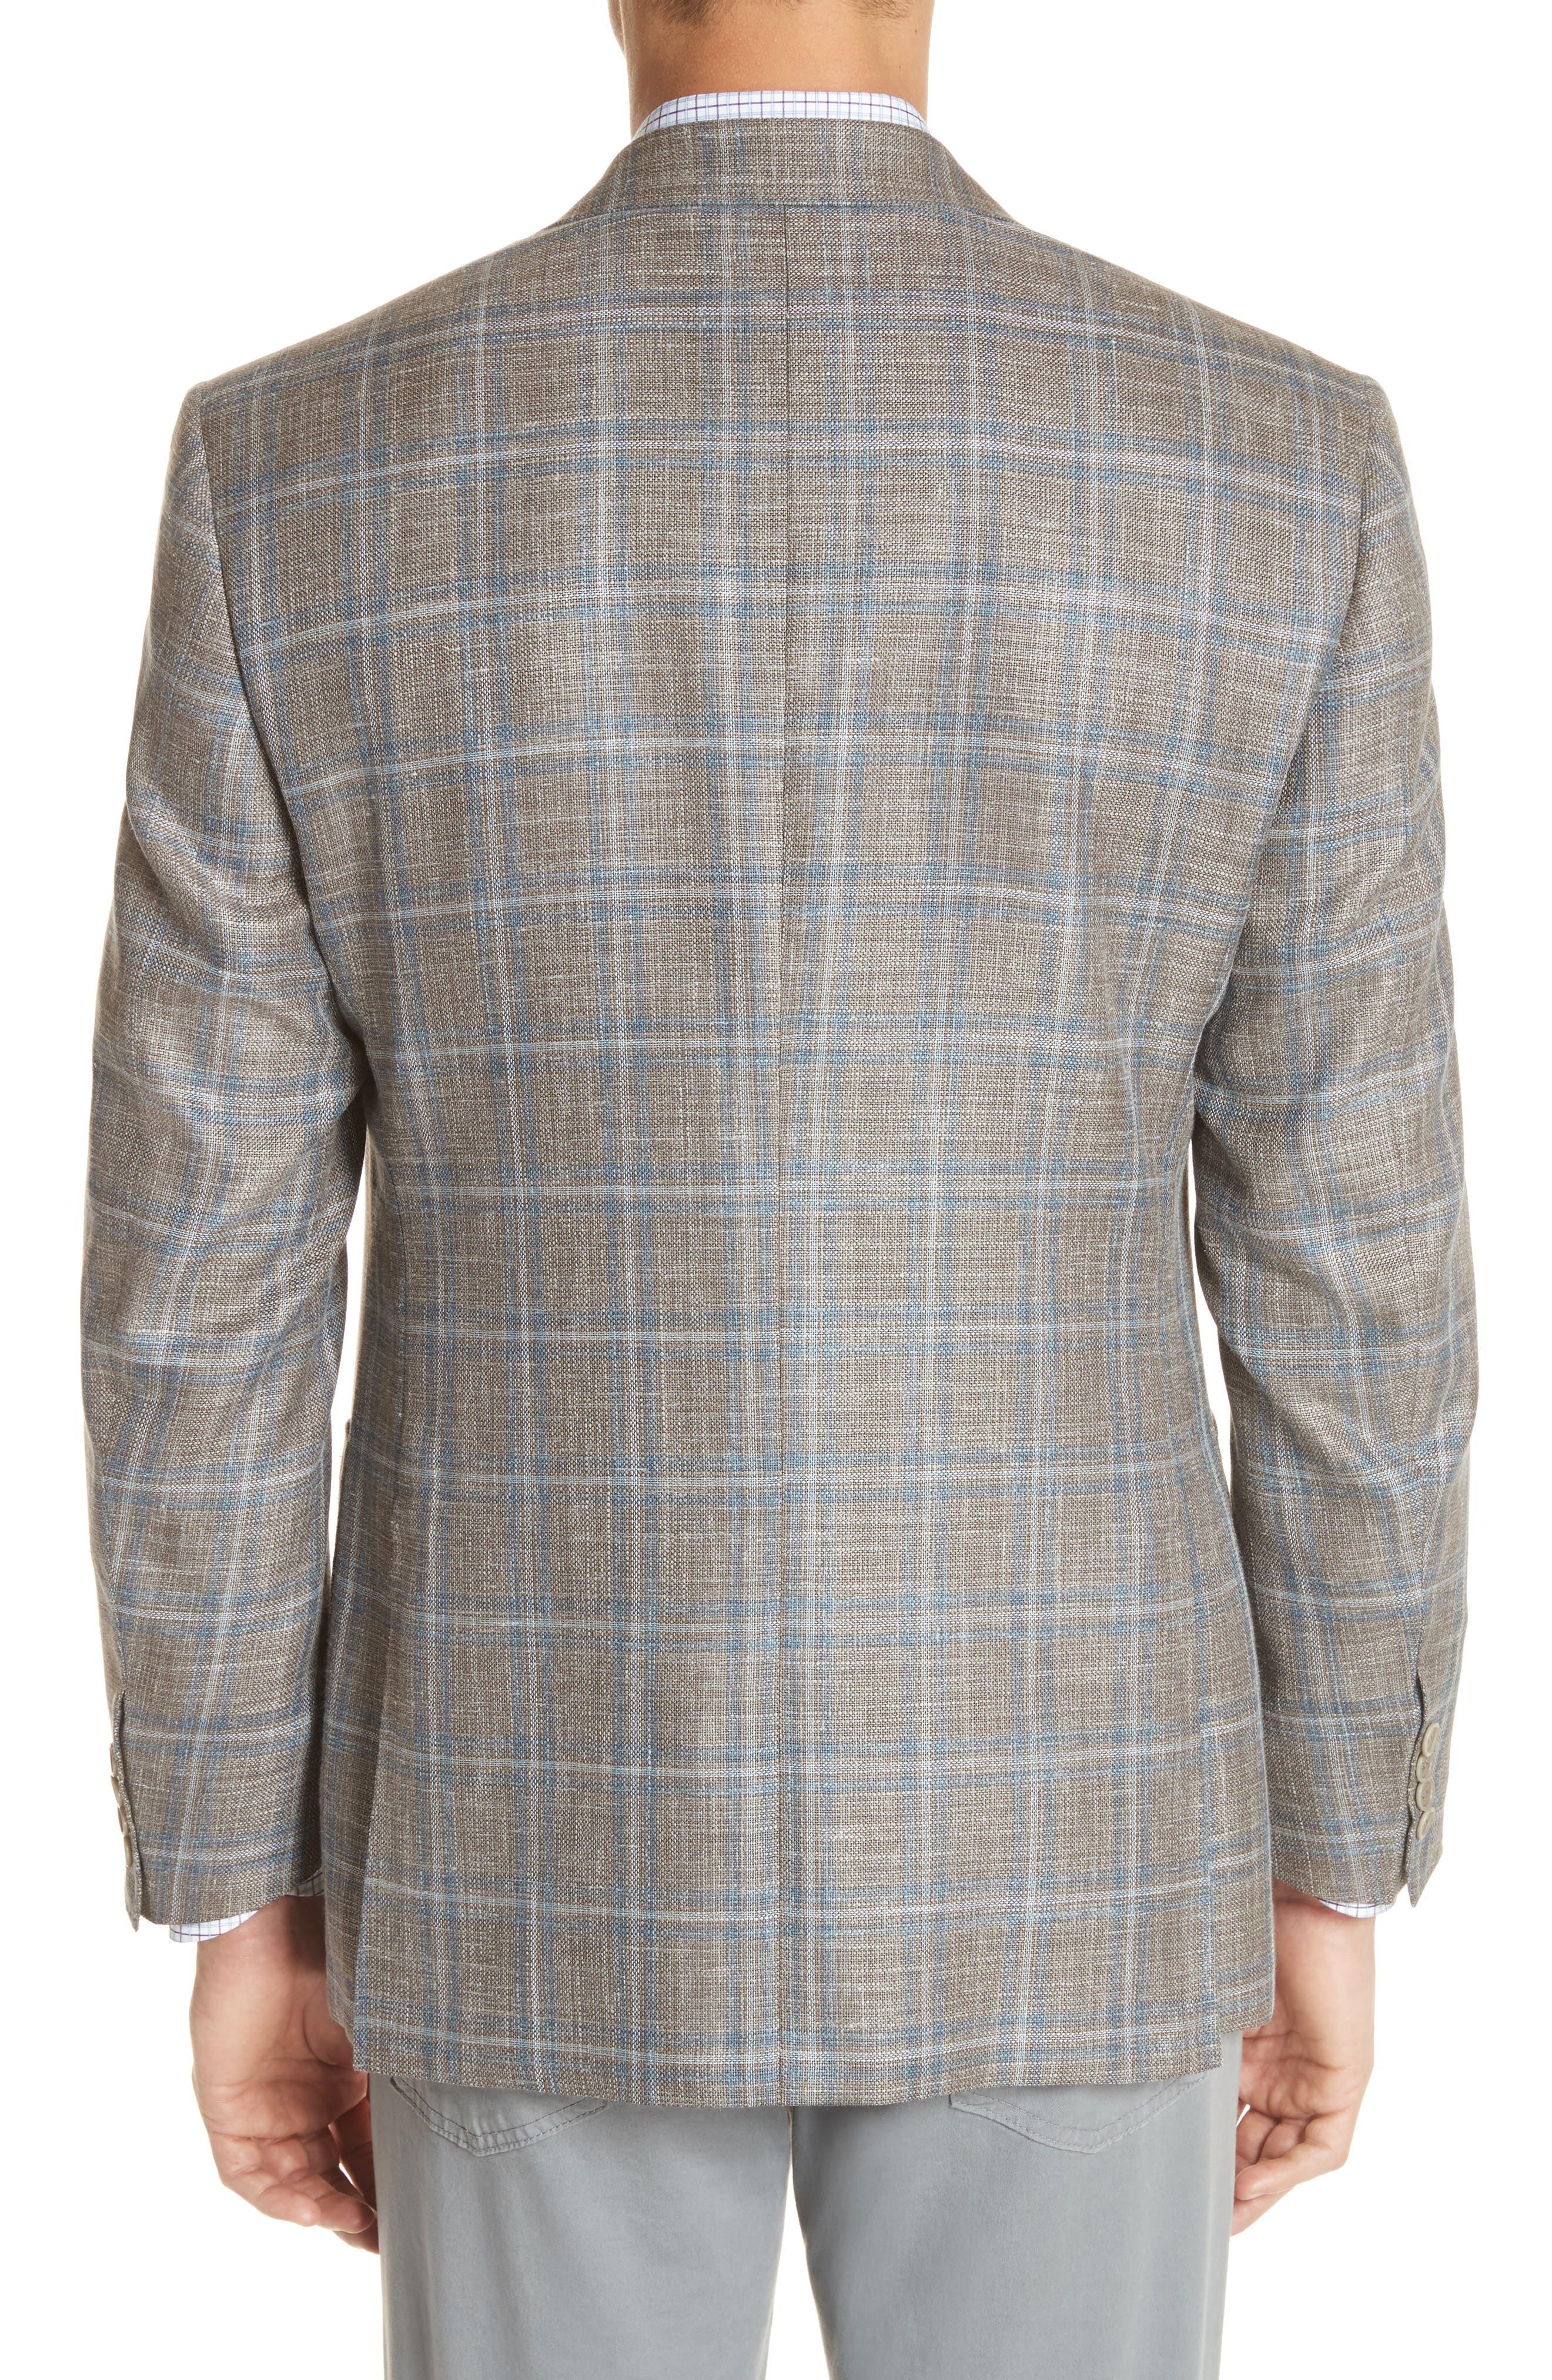 CANALI,                             Kei Classic Fit Windowpane Wool Blend Sport Coat,                             Alternate thumbnail 2, color,                             250